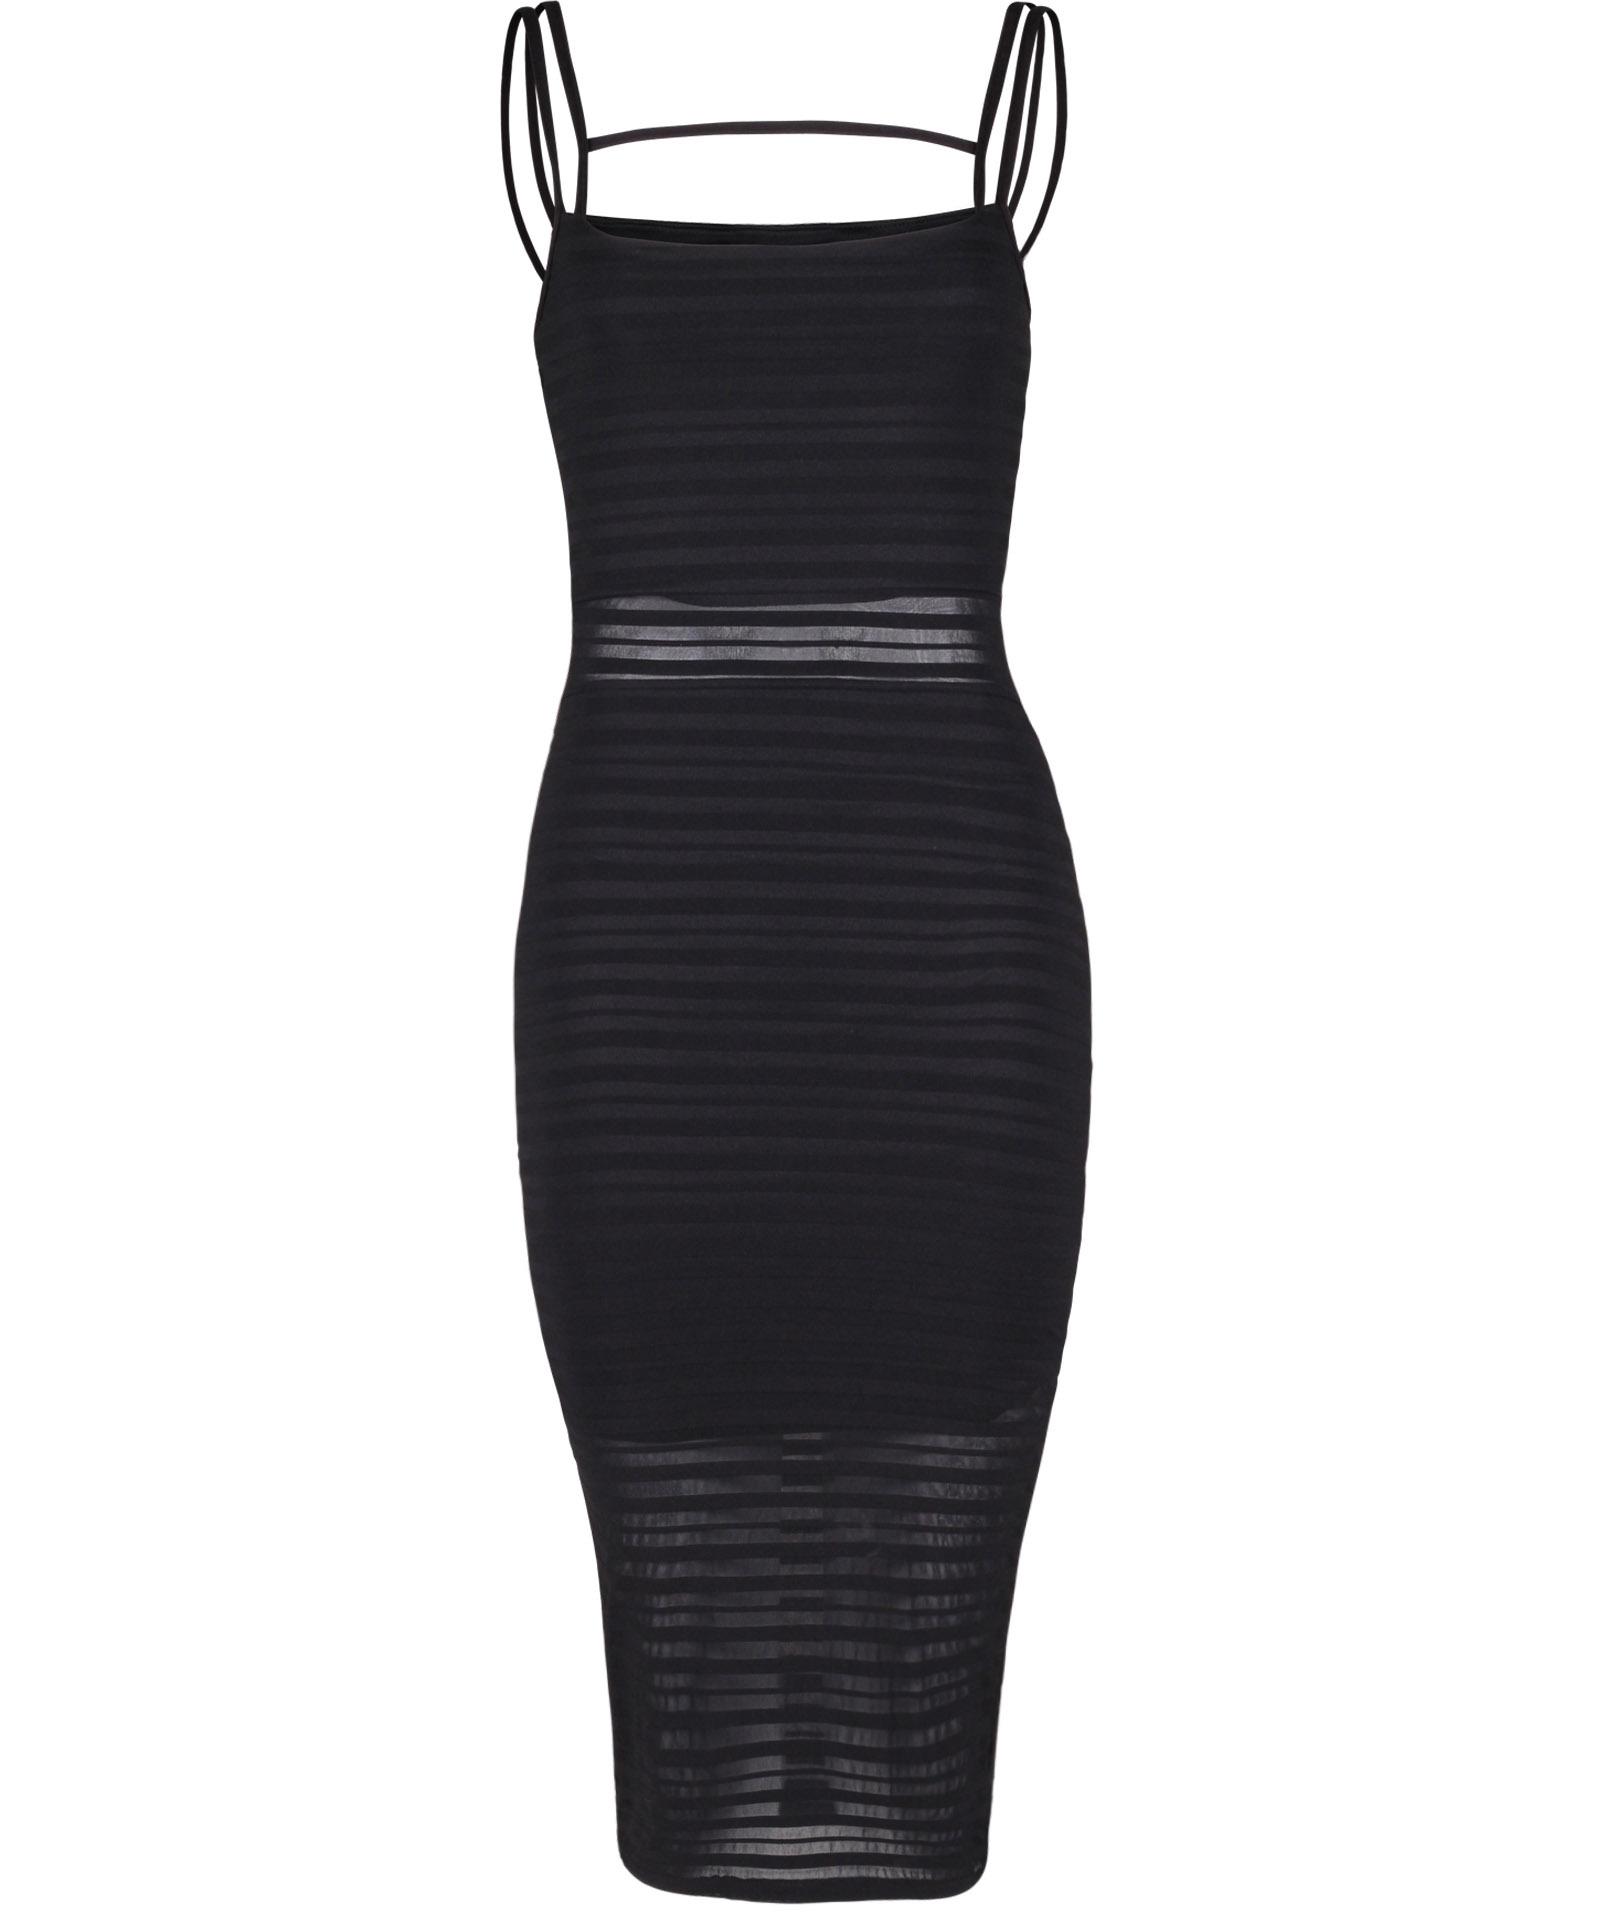 View Item Striped Mesh Bodycon Dress